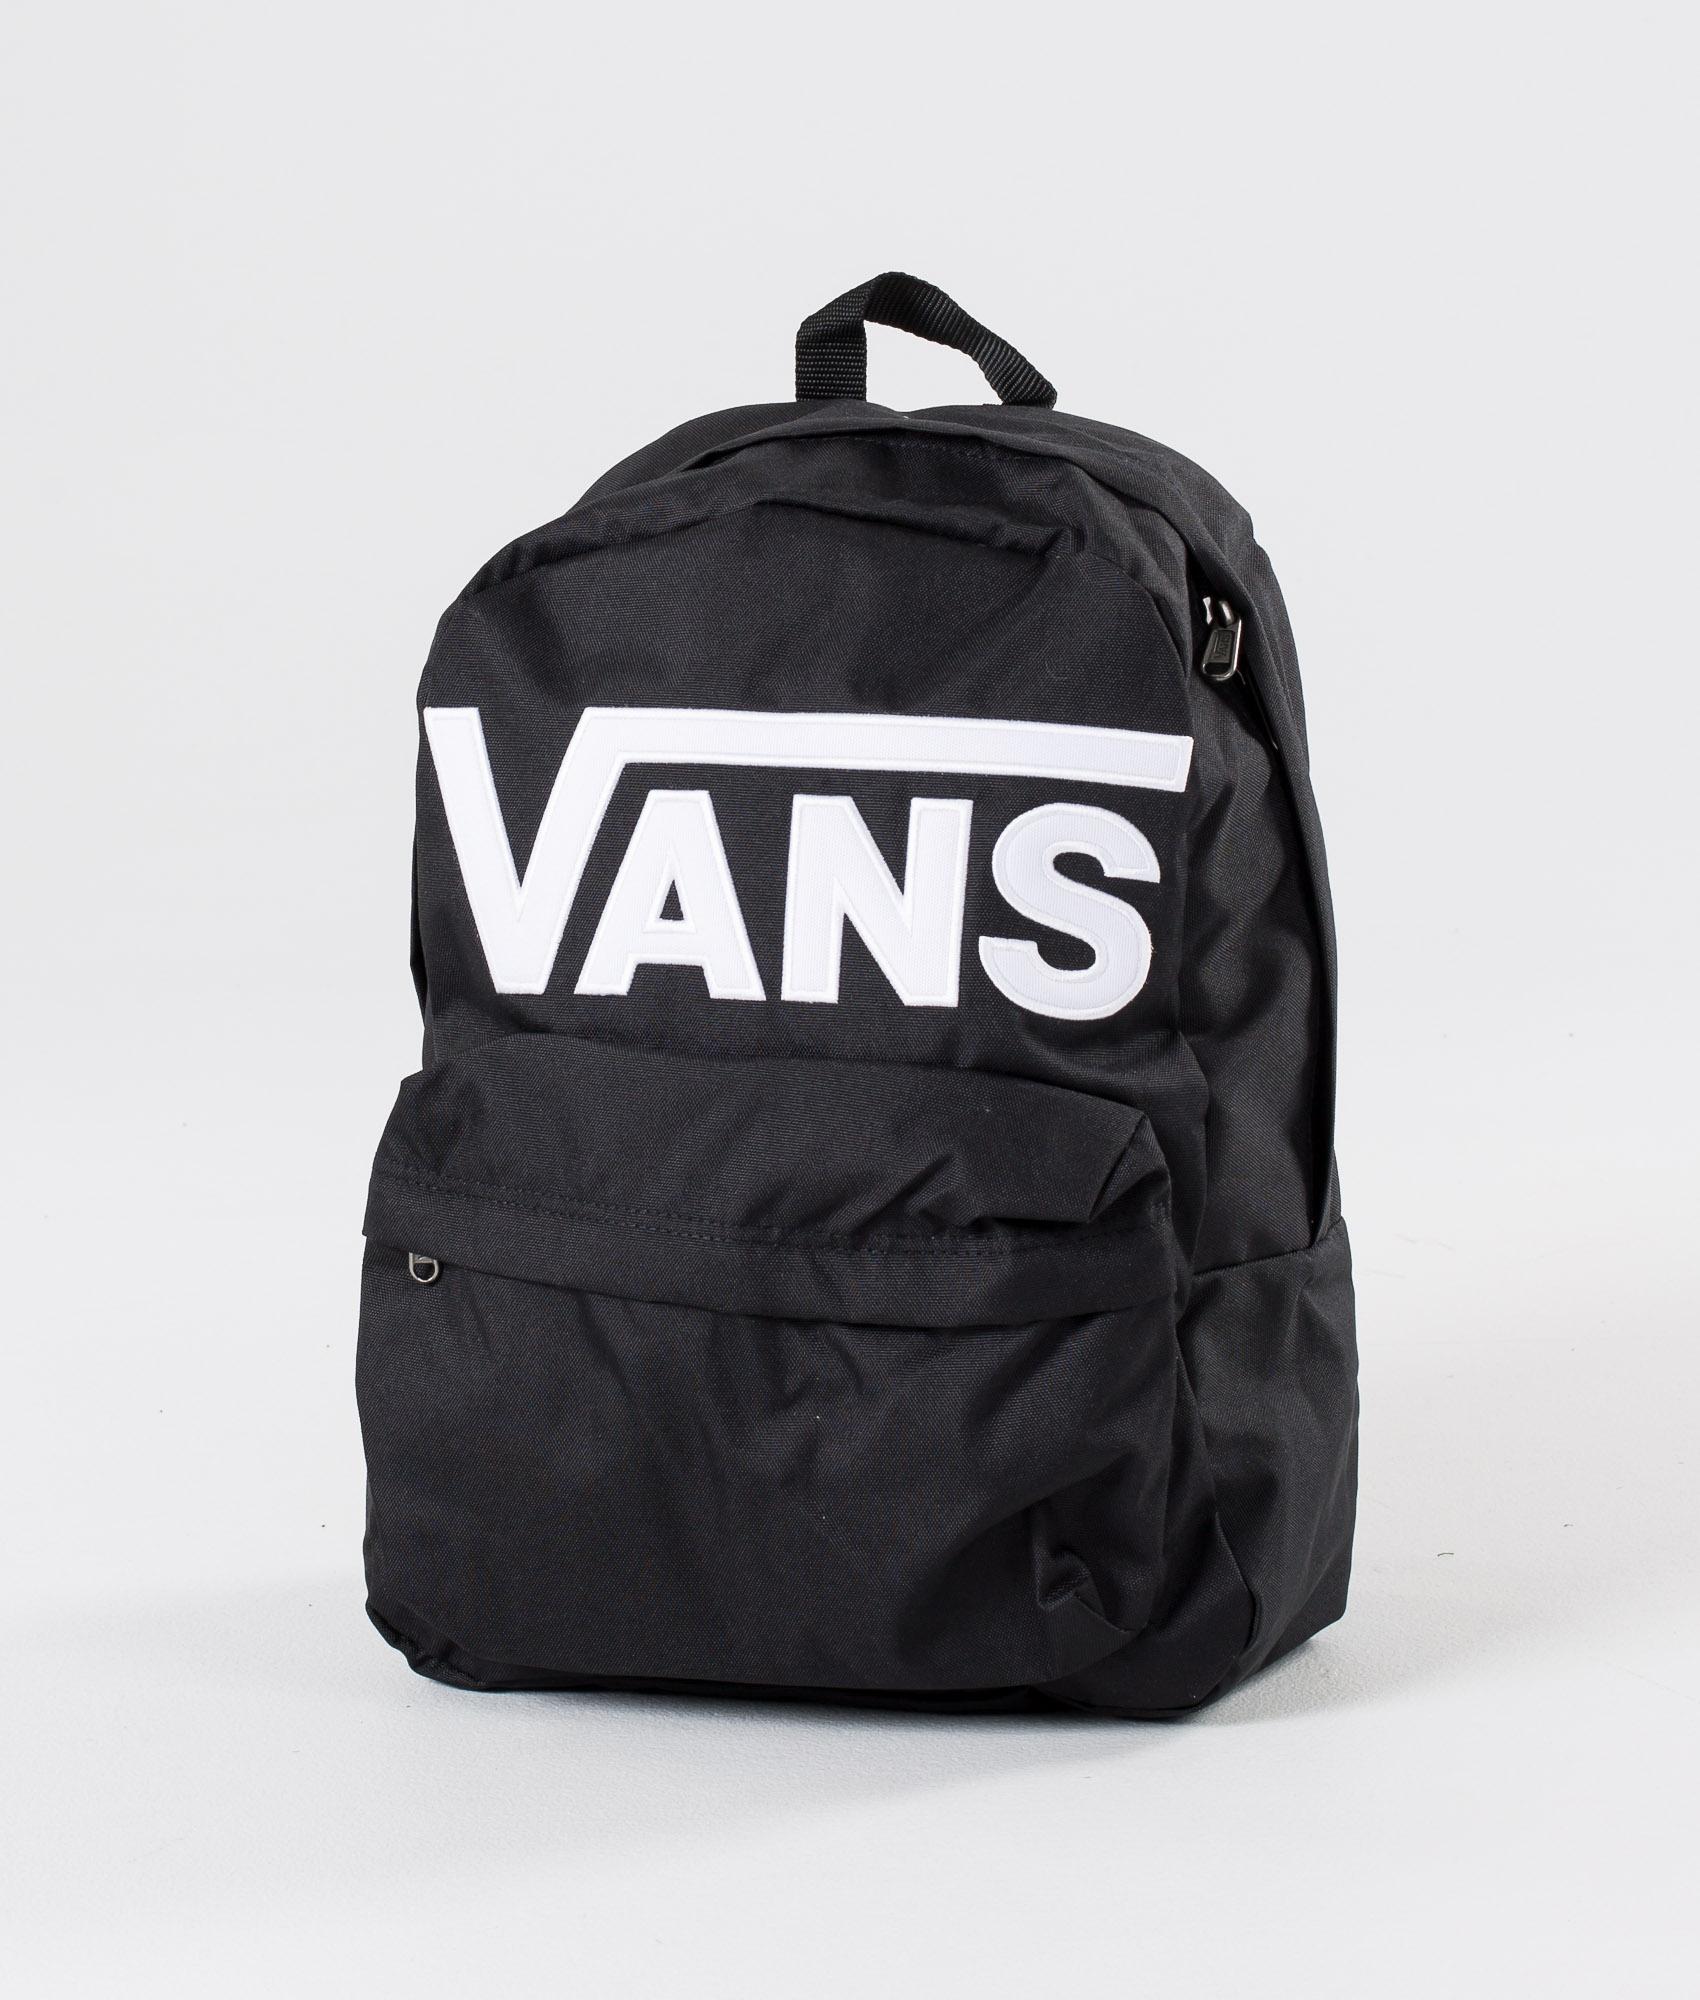 Vans Old Skool III Backpack Väska BlackWhite